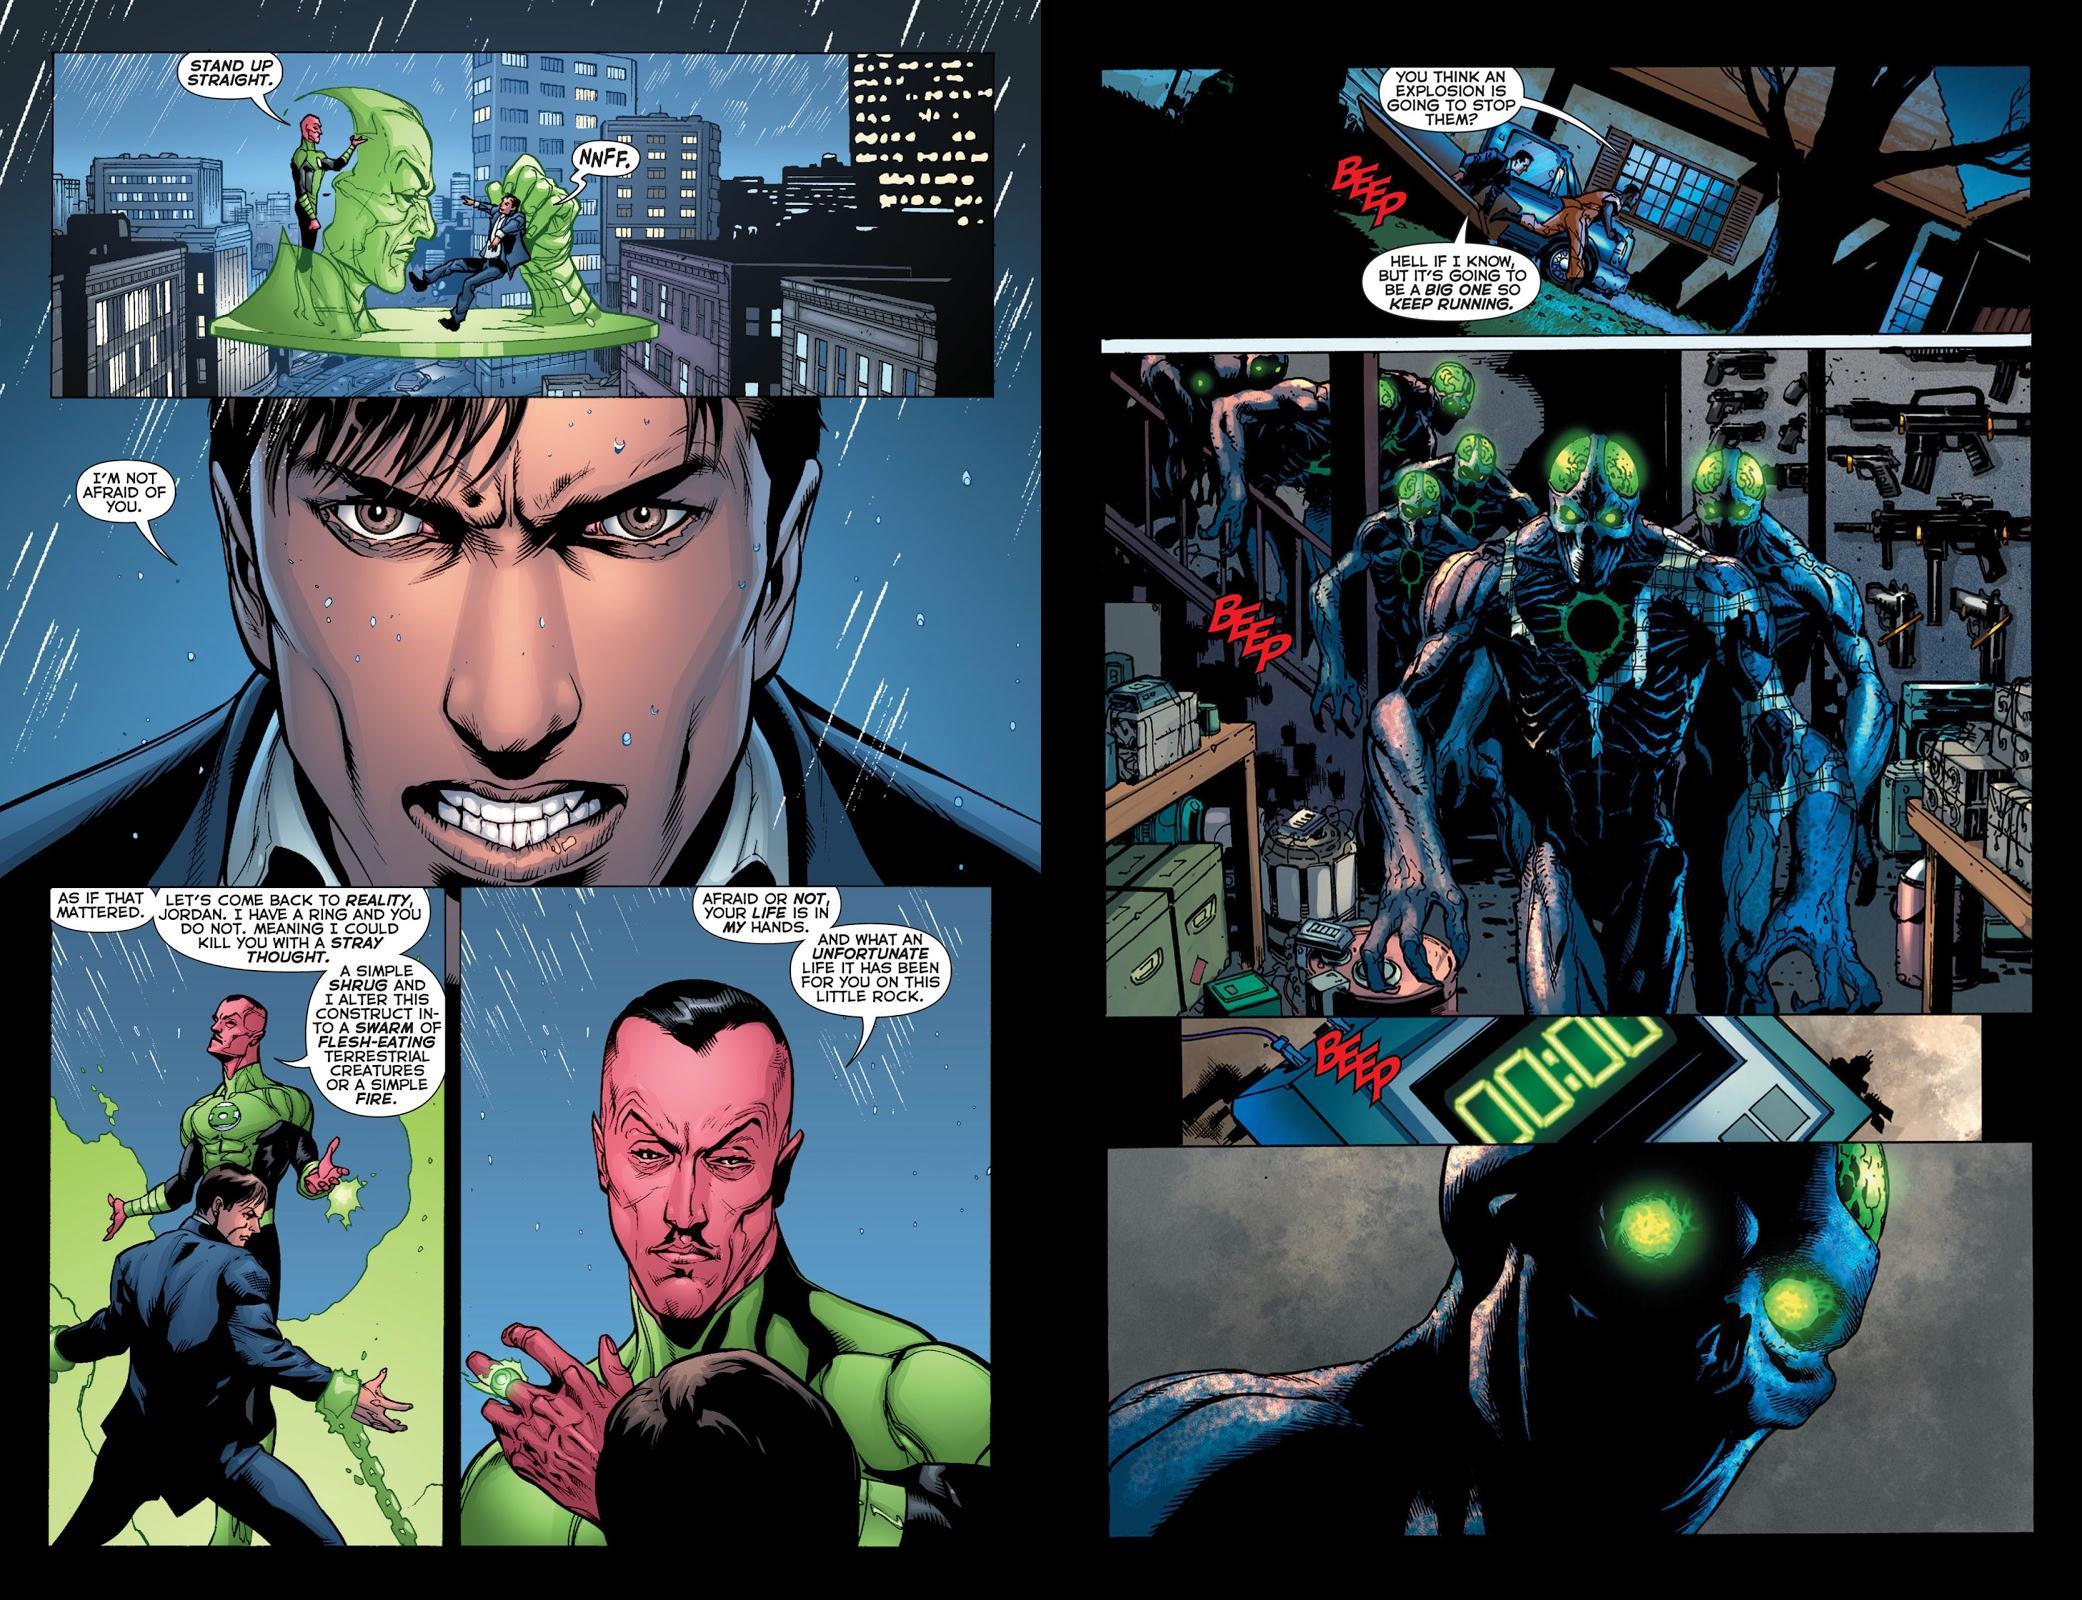 Green Lantern by Geoff Johns Omnibus V3 review